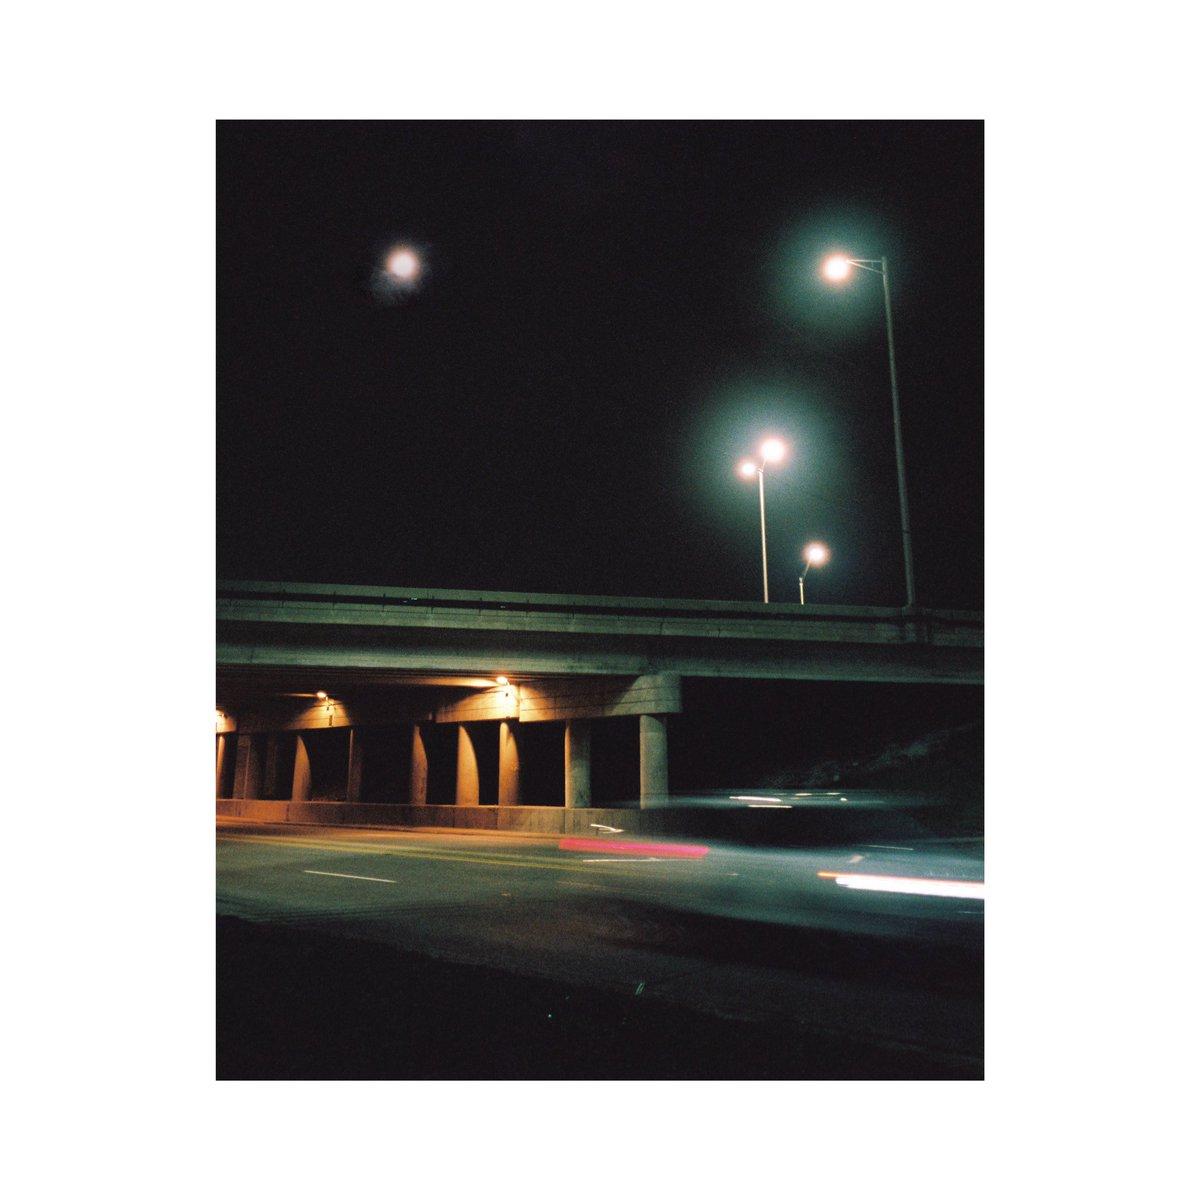 Late night walk for snacks somewhere outside of Chicago. I love that I can shoot this little camera handheld at night. - #FujifilmKlasseW #KodakUltraMax400 #IndieFilmLab #longlivefilm #kodakfilm #madewithkodakpic.twitter.com/xp4Agiogi3